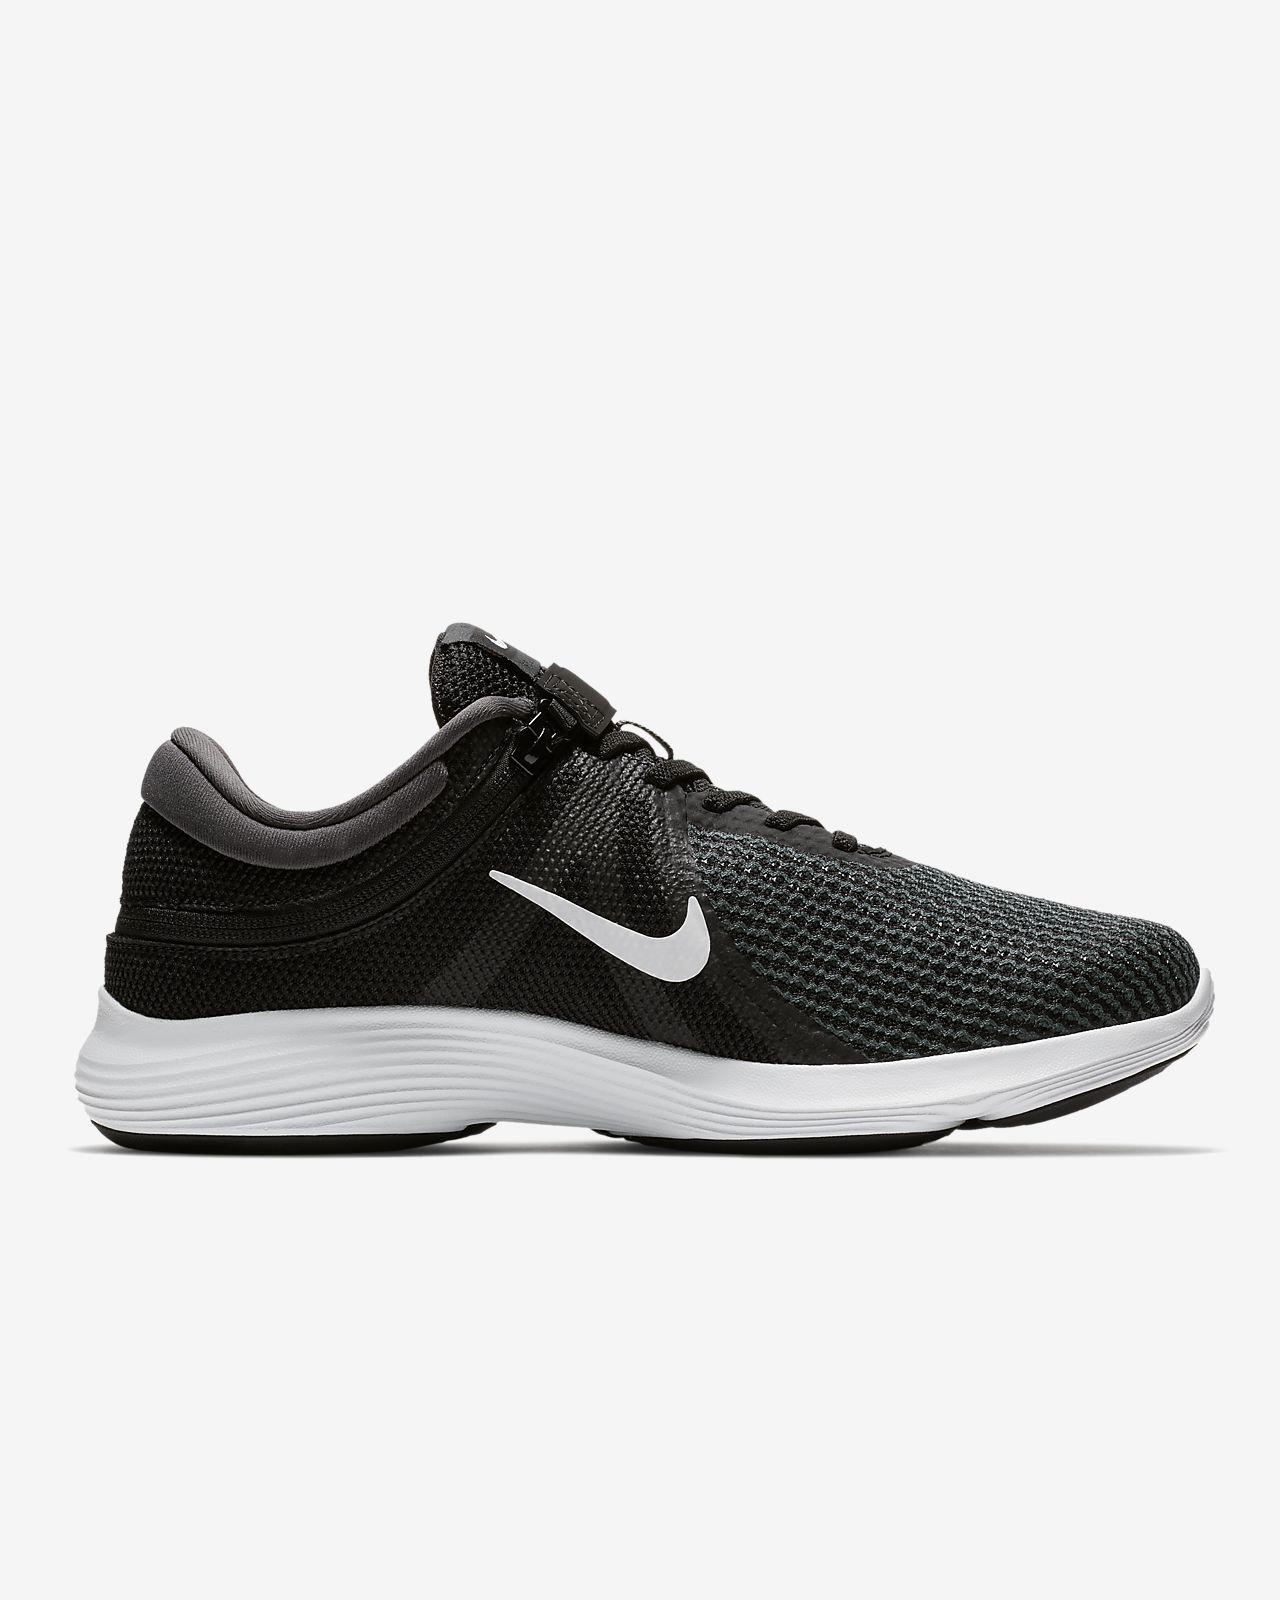 hot sale online 50dff 8ea3e ... Nike Revolution 4 FlyEase (Extra-Wide) Men s Running Shoe